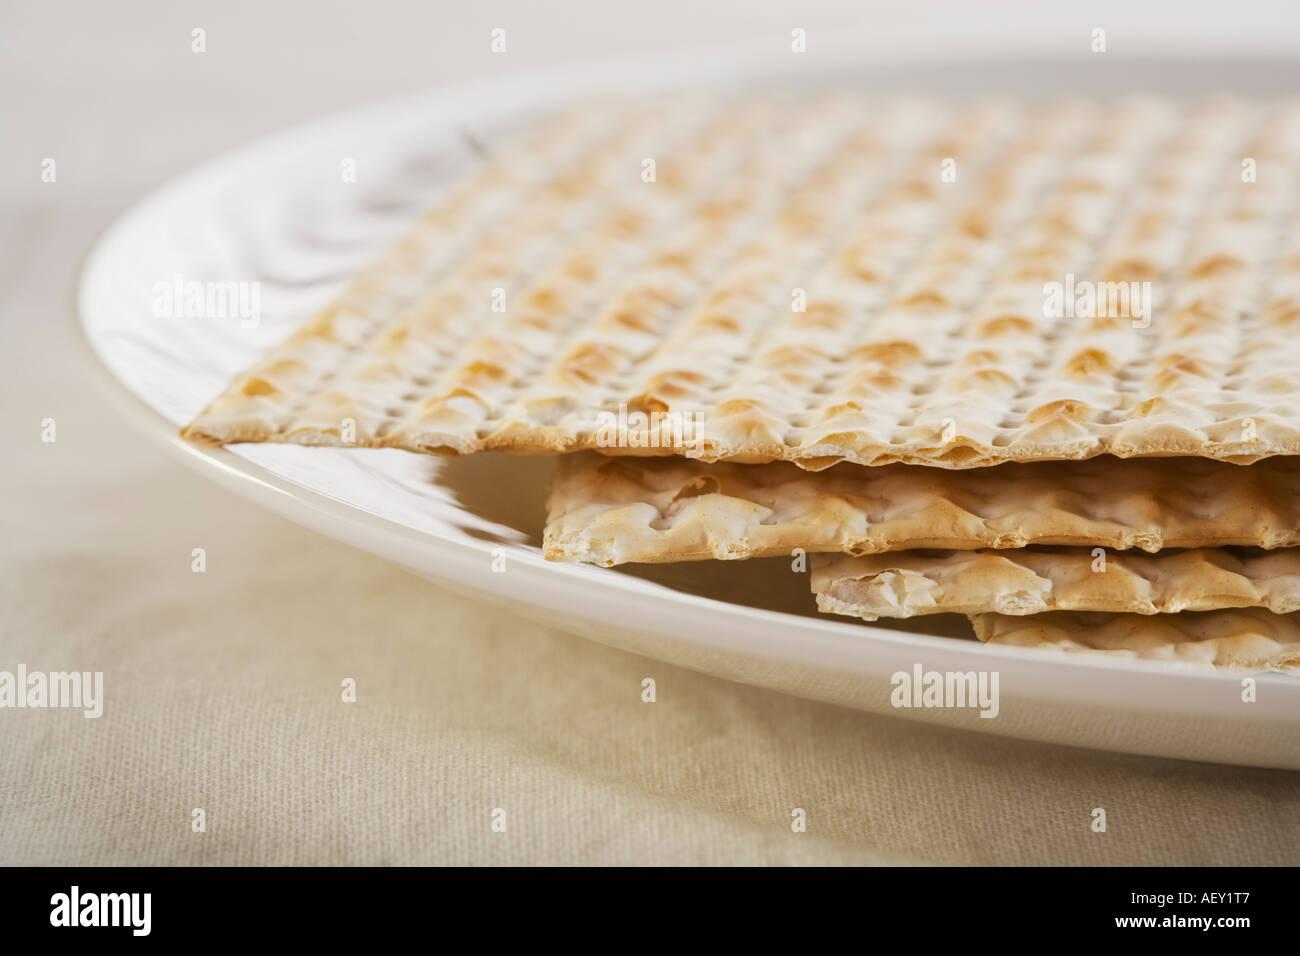 Close up of plate of Matzah - Stock Image